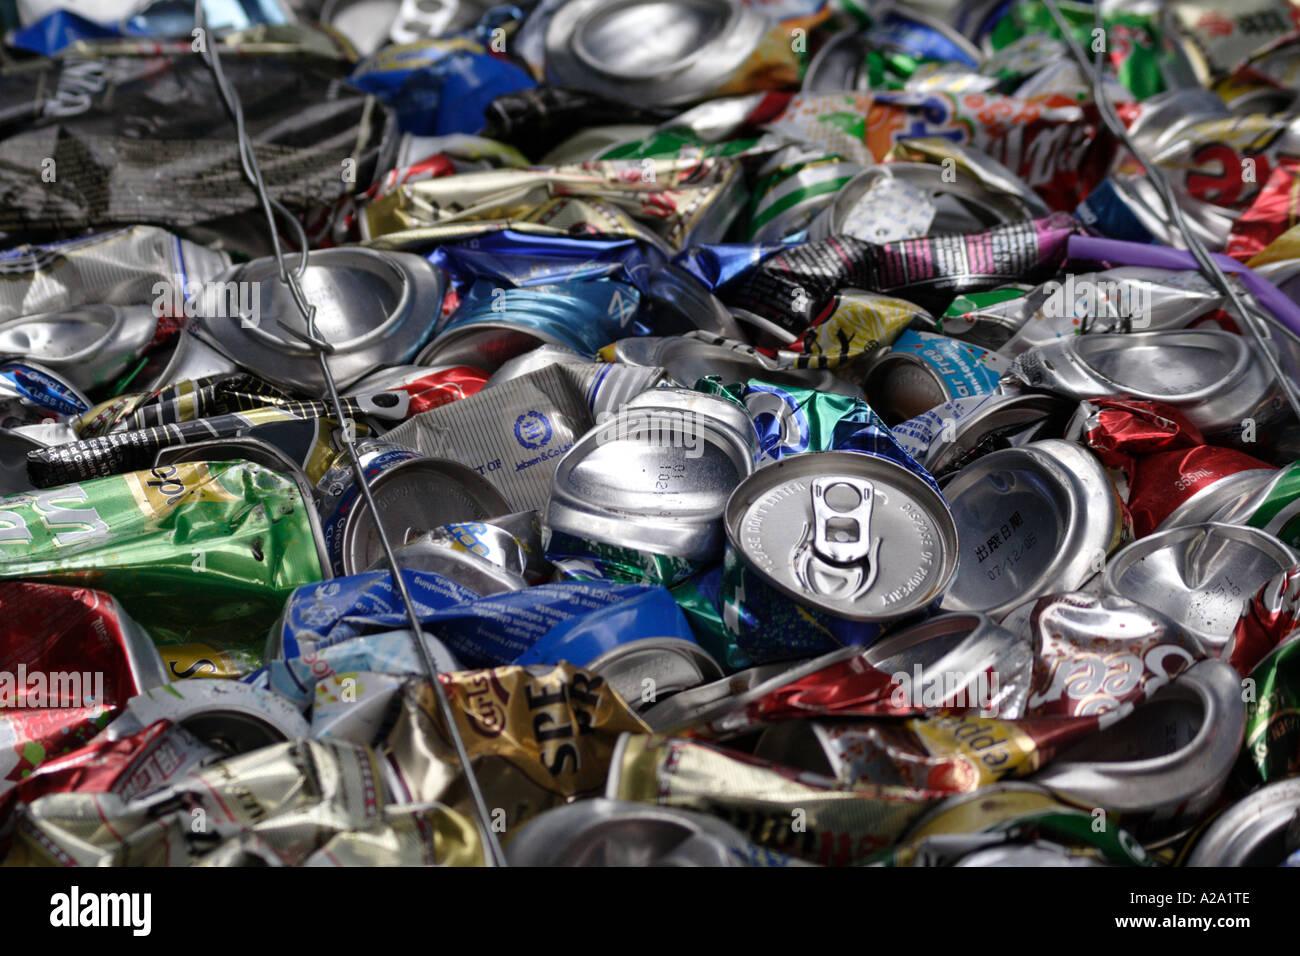 Crushed aluminum cans in a recycling bail, Hong Kong, China - Stock Image